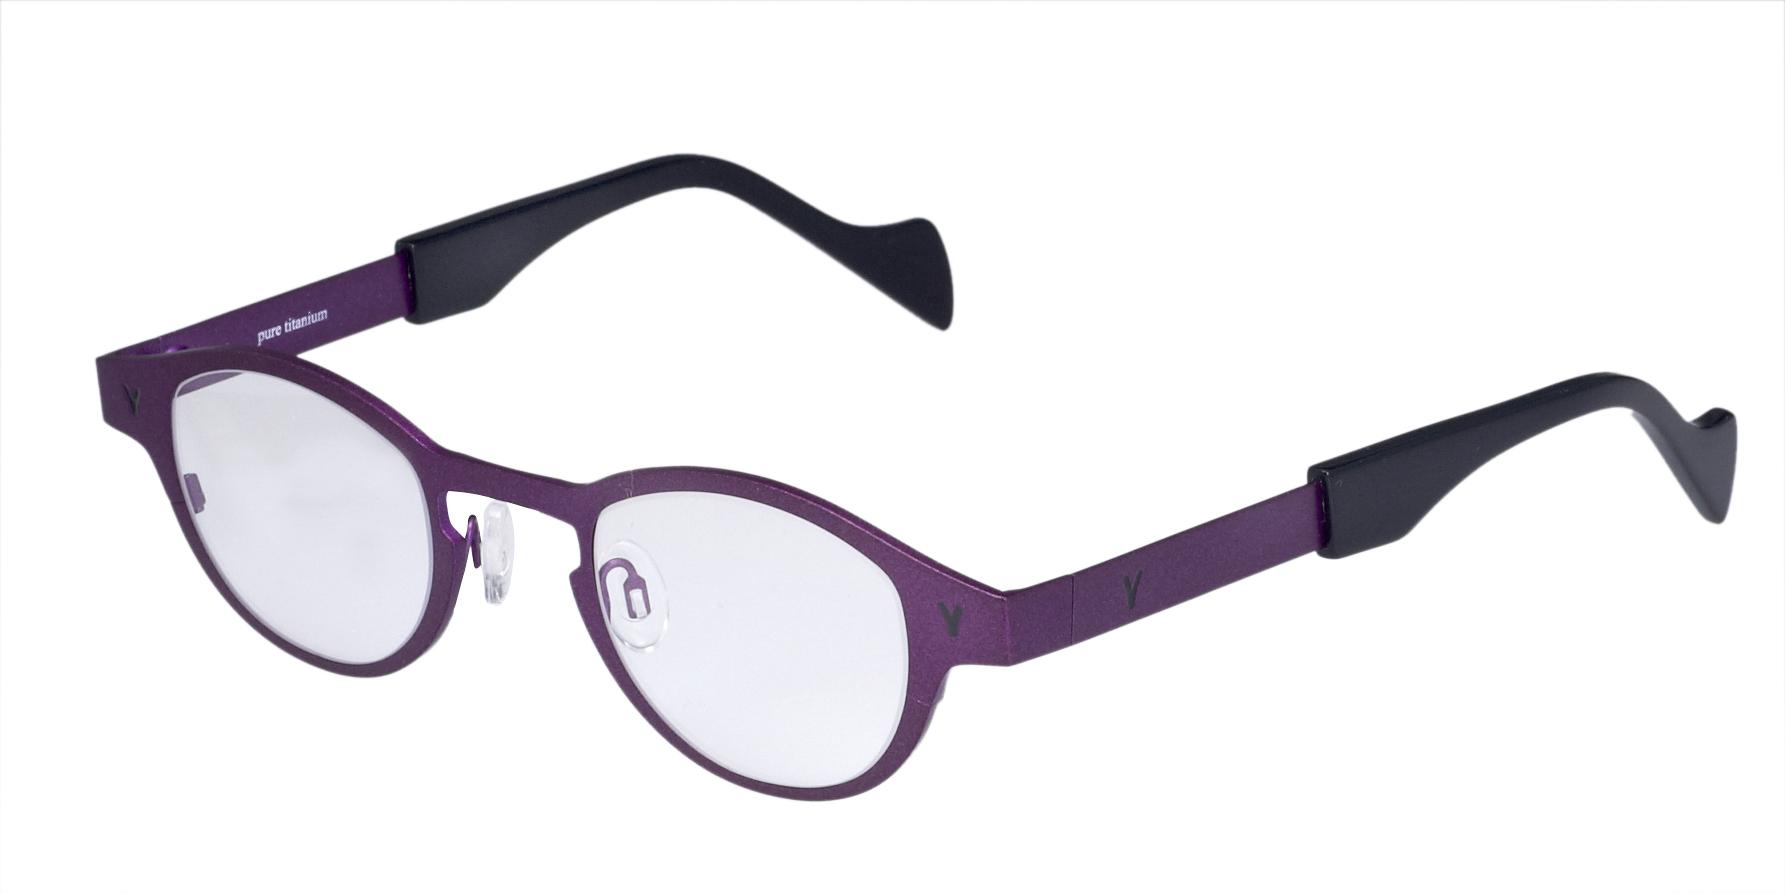 werubel optic boutiqe 2590₪